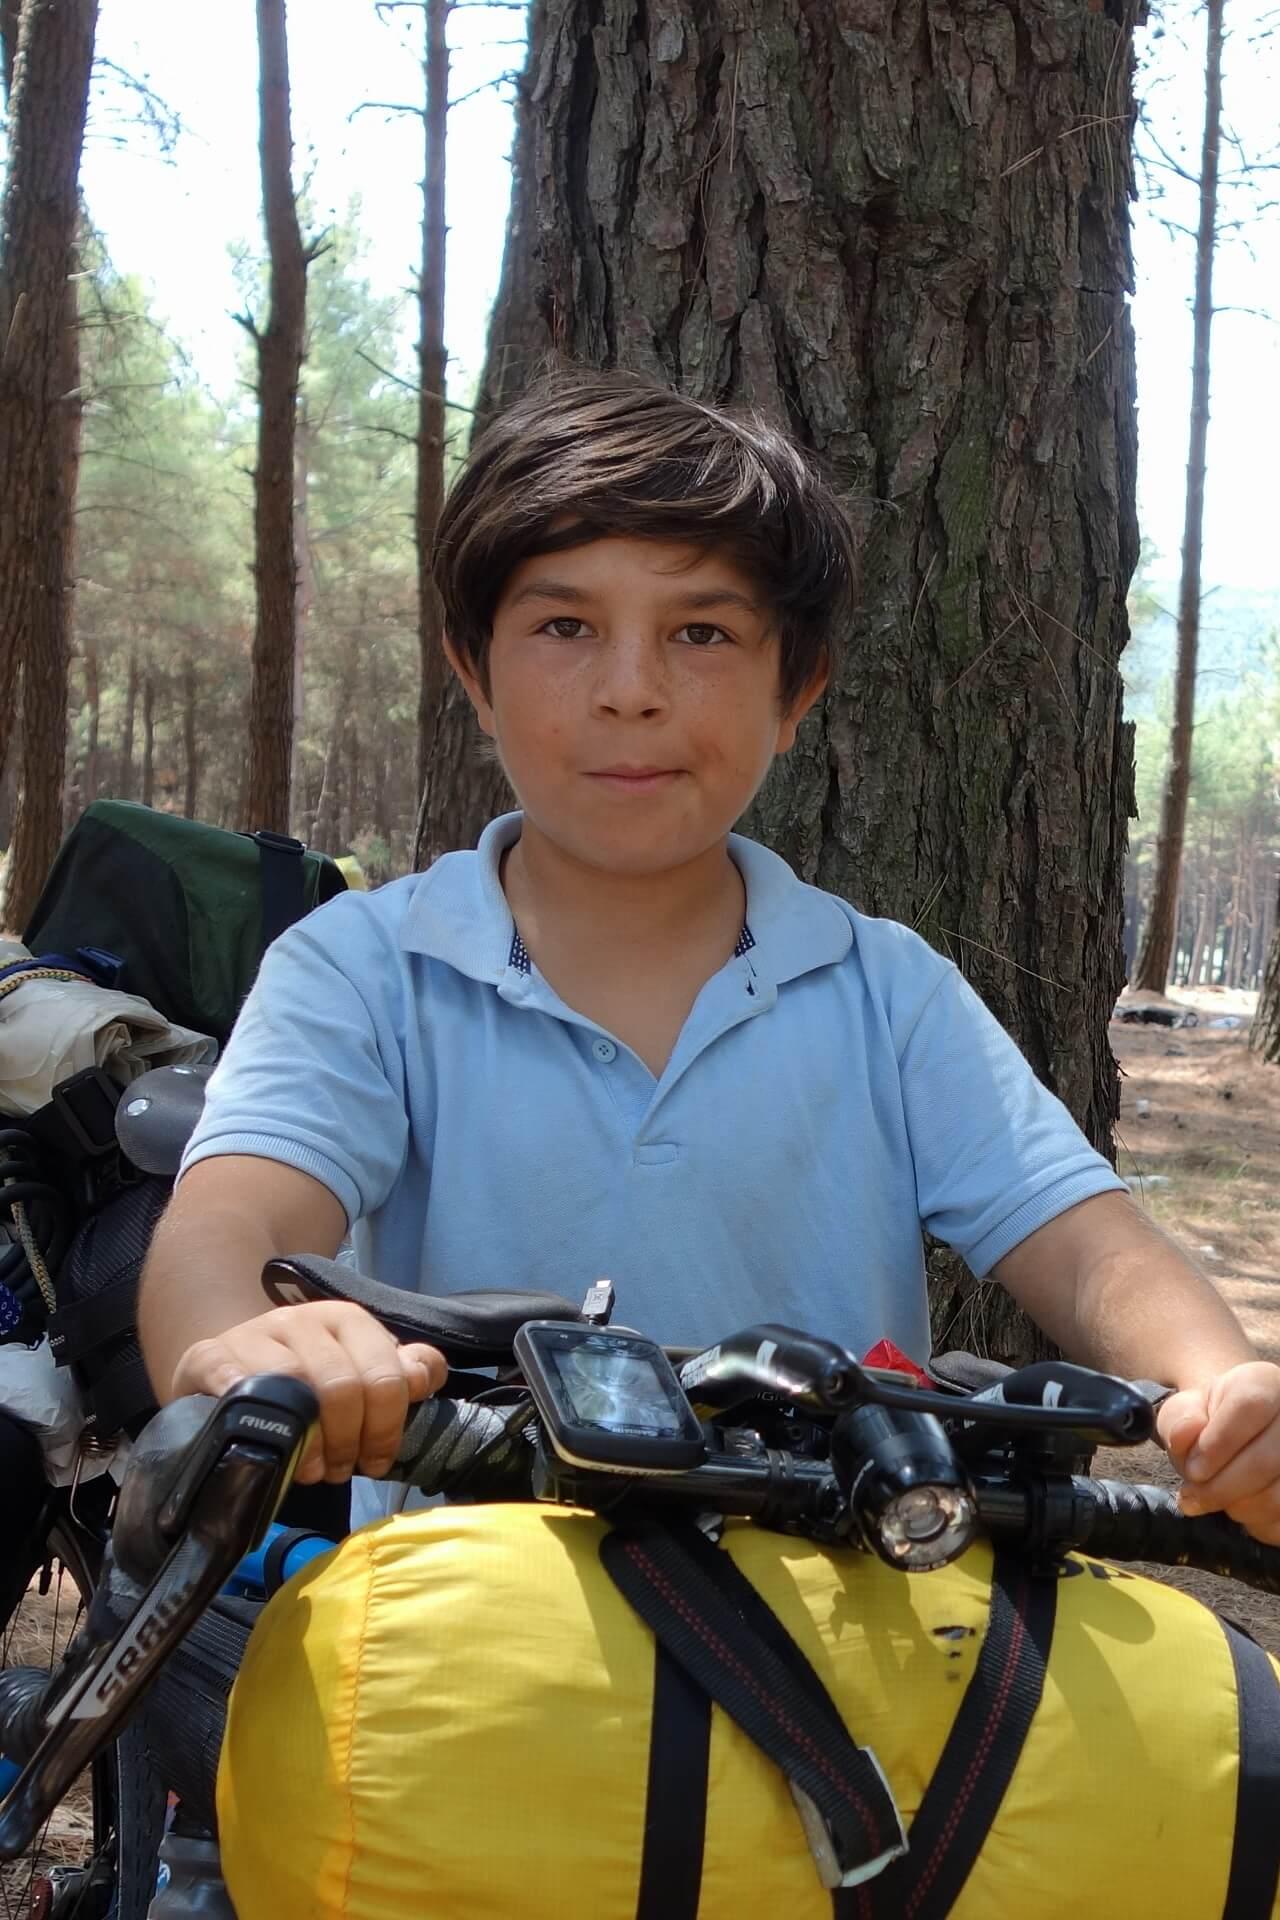 profugo in Turchia